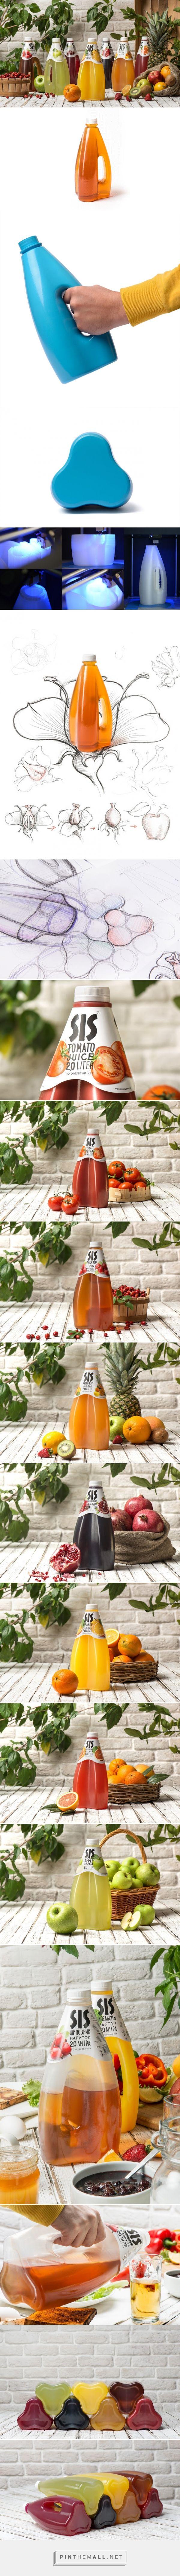 SIS Juice Packaging designed by Backbone Branding (Armenia) - http://www.packagingoftheworld.com/2016/02/sis.html